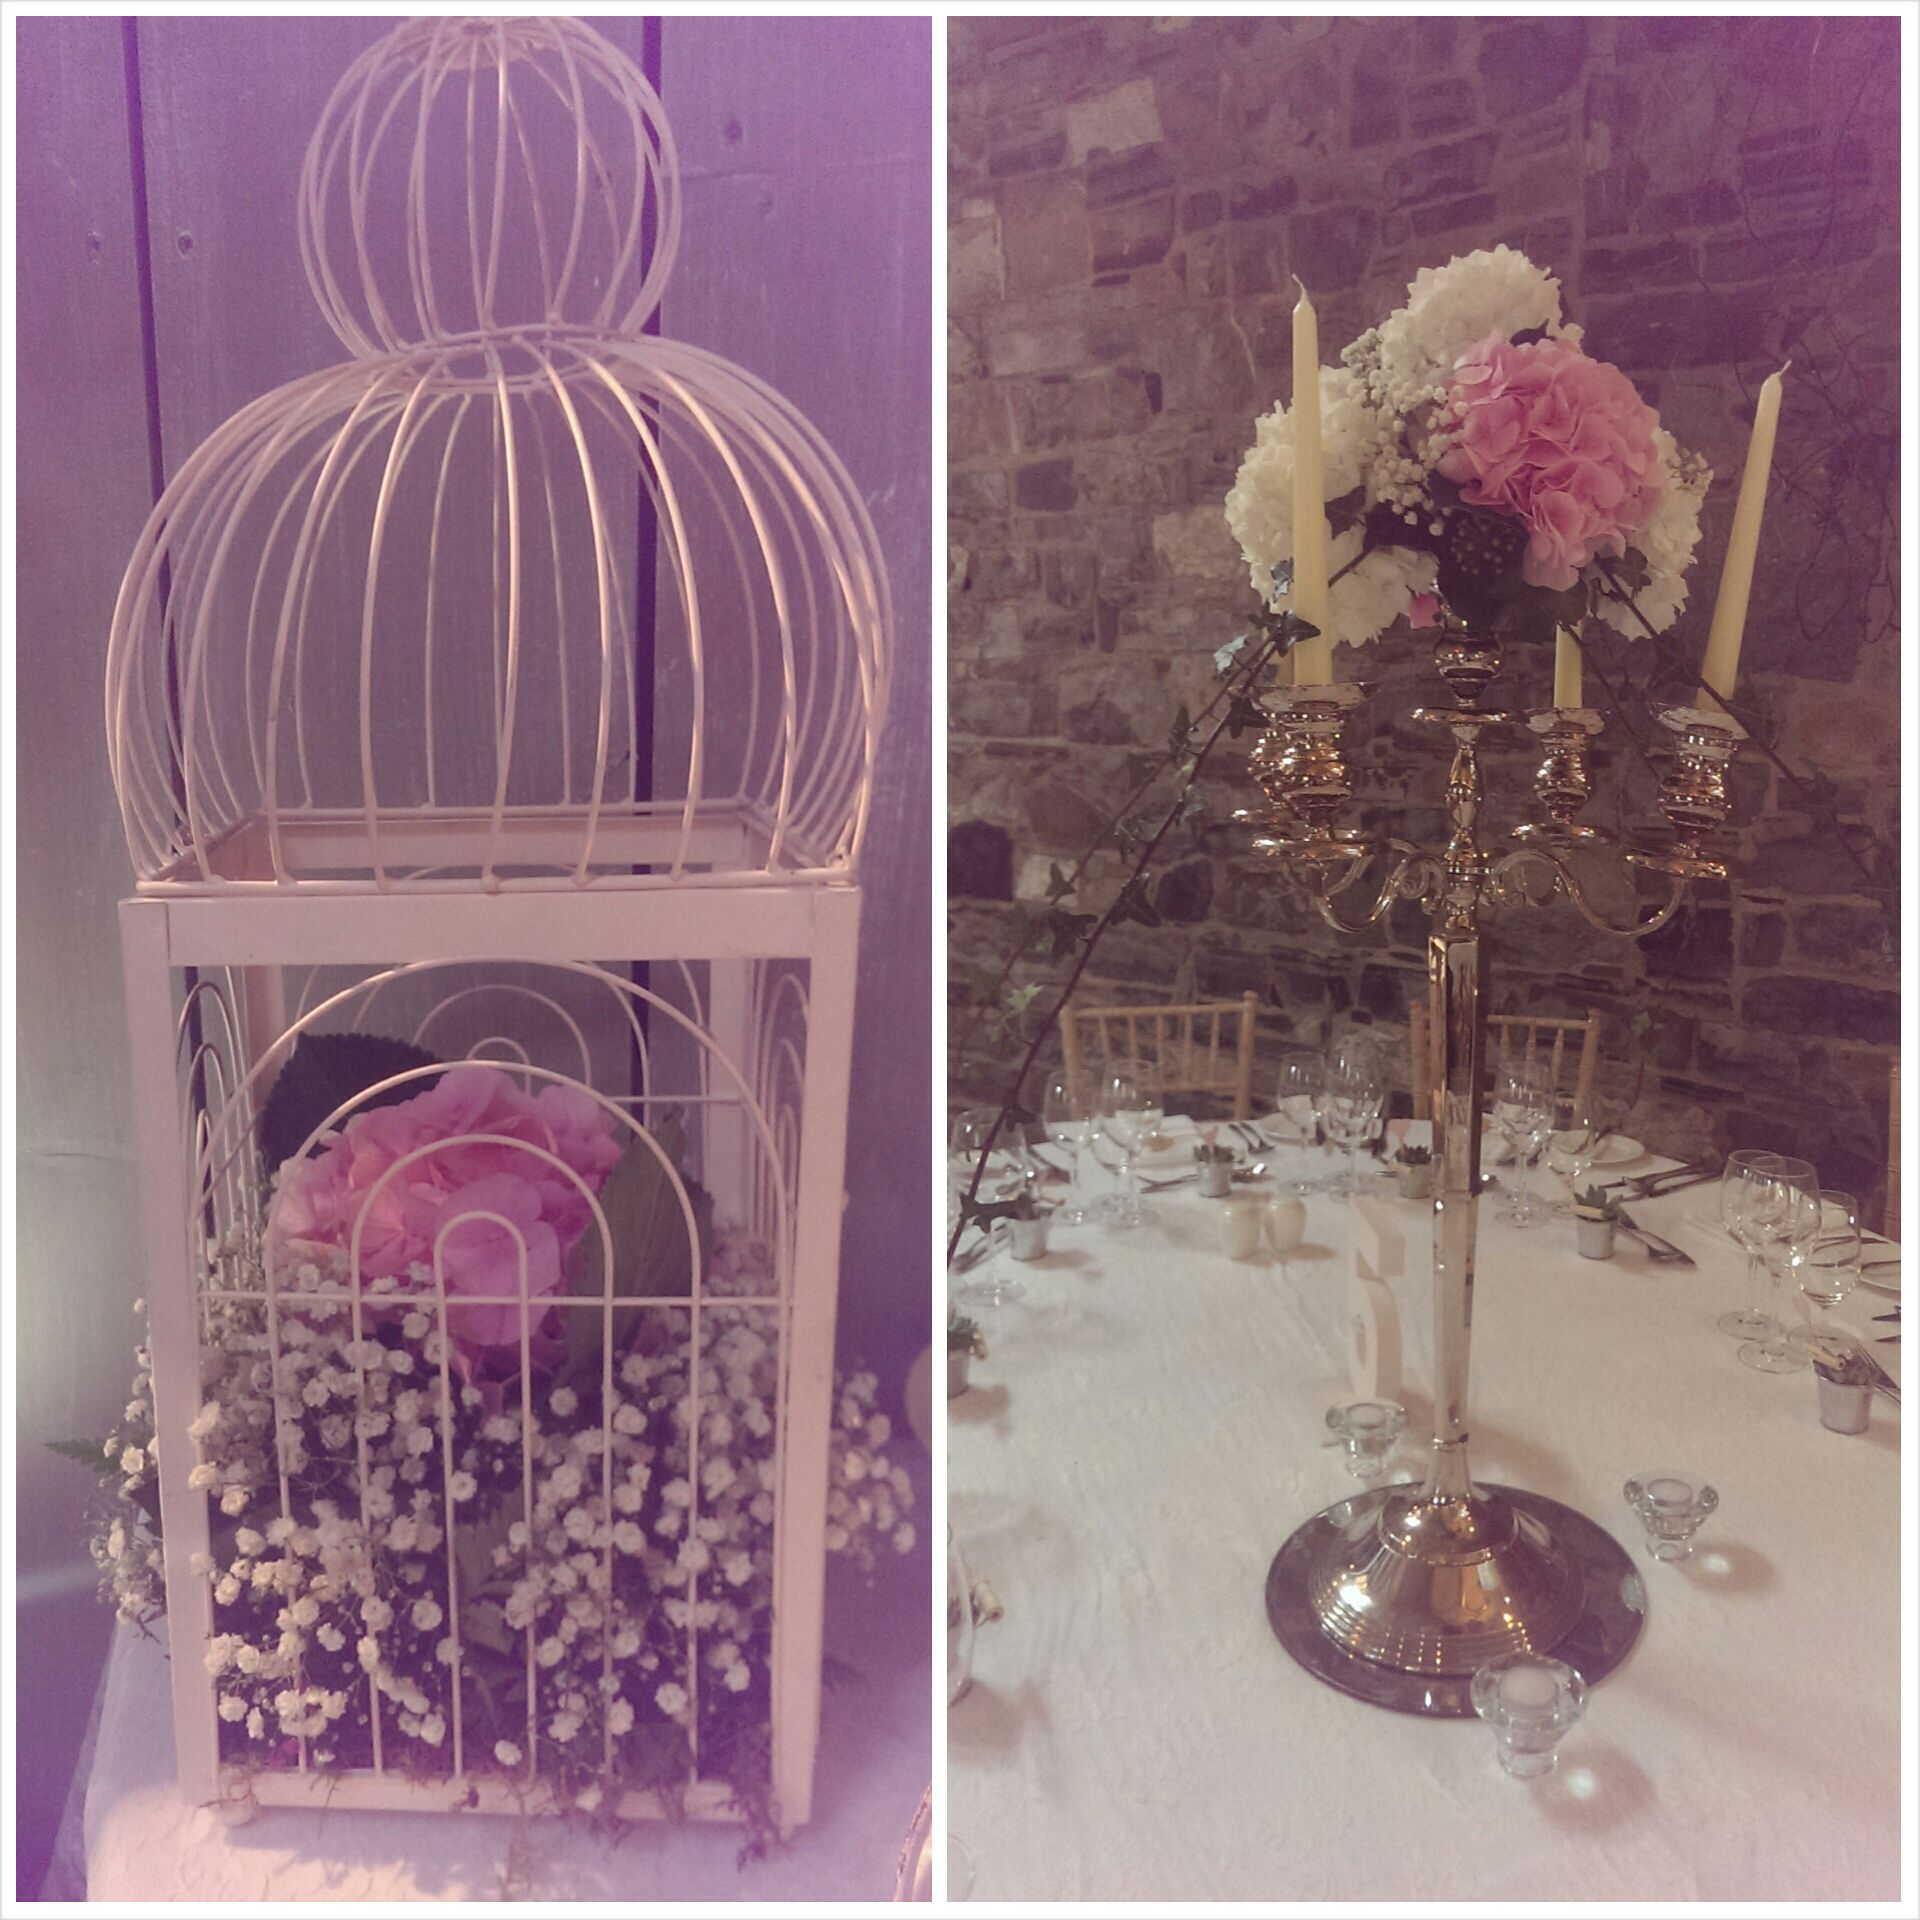 Floral candelabras and birdcage centrepieces